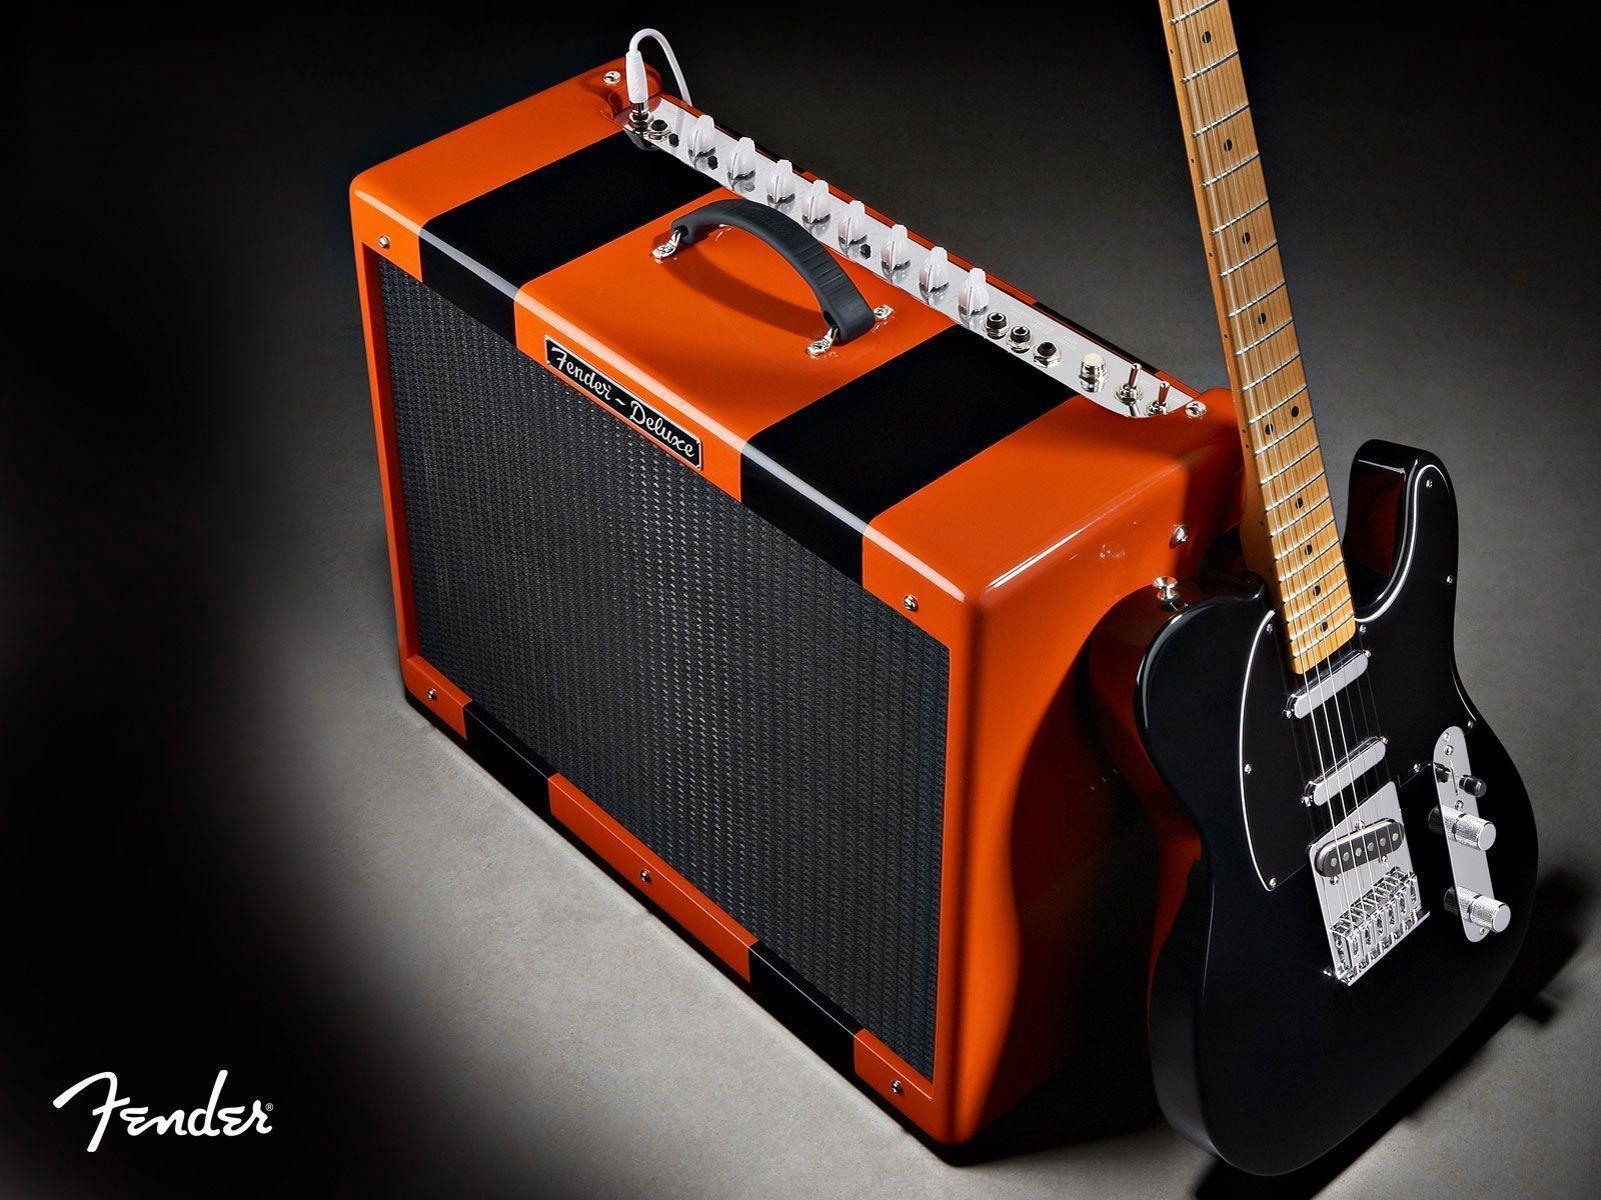 Fender Telecaster Wallpapers 1601x1200